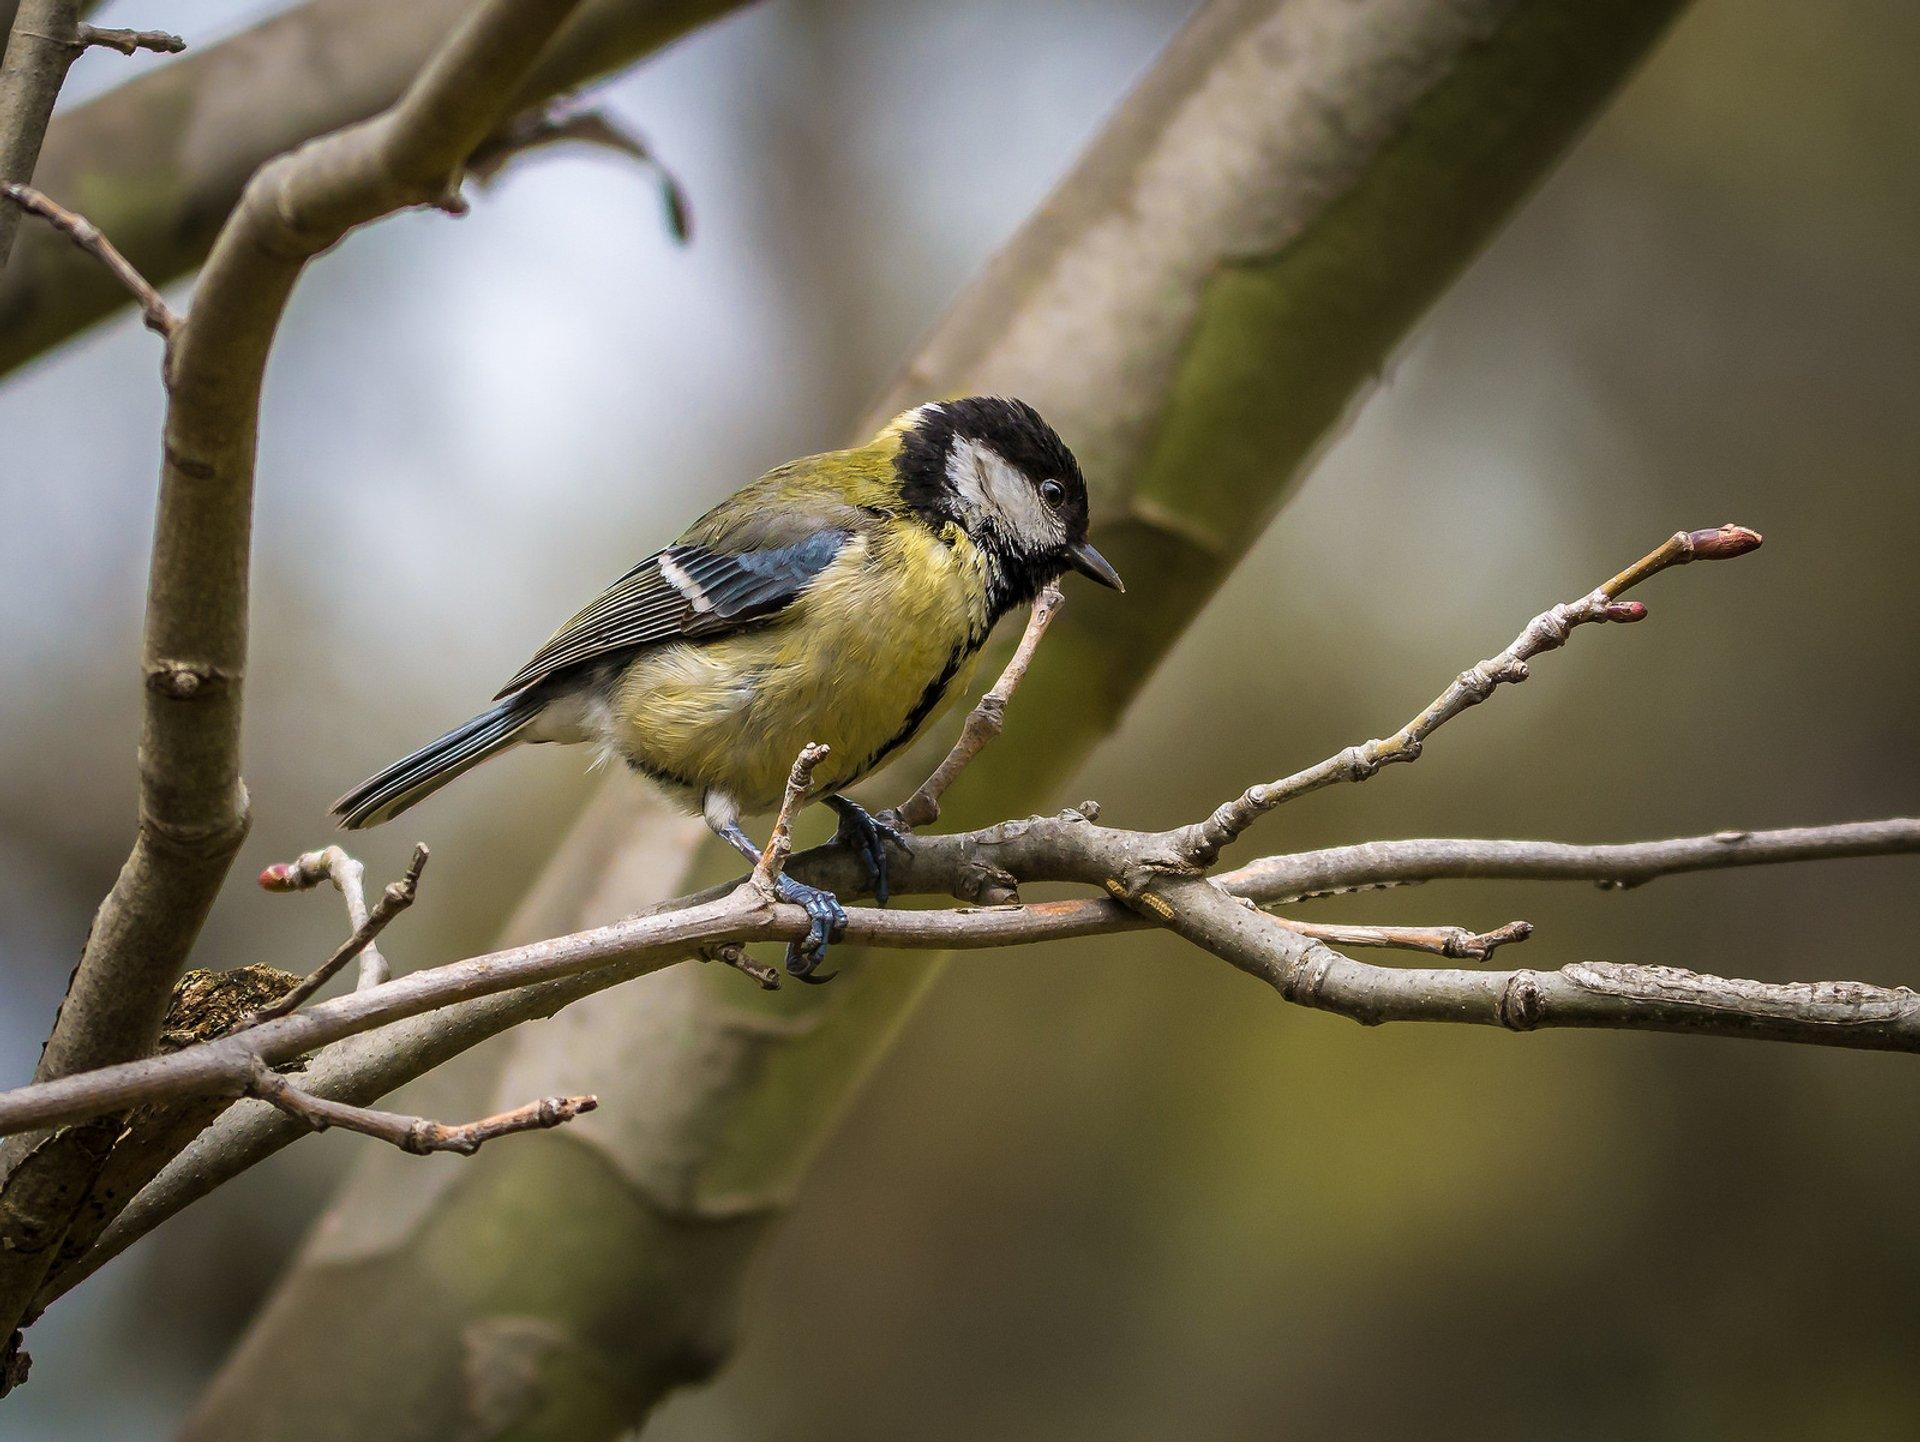 Birdwatching in Albania 2019 - Best Time